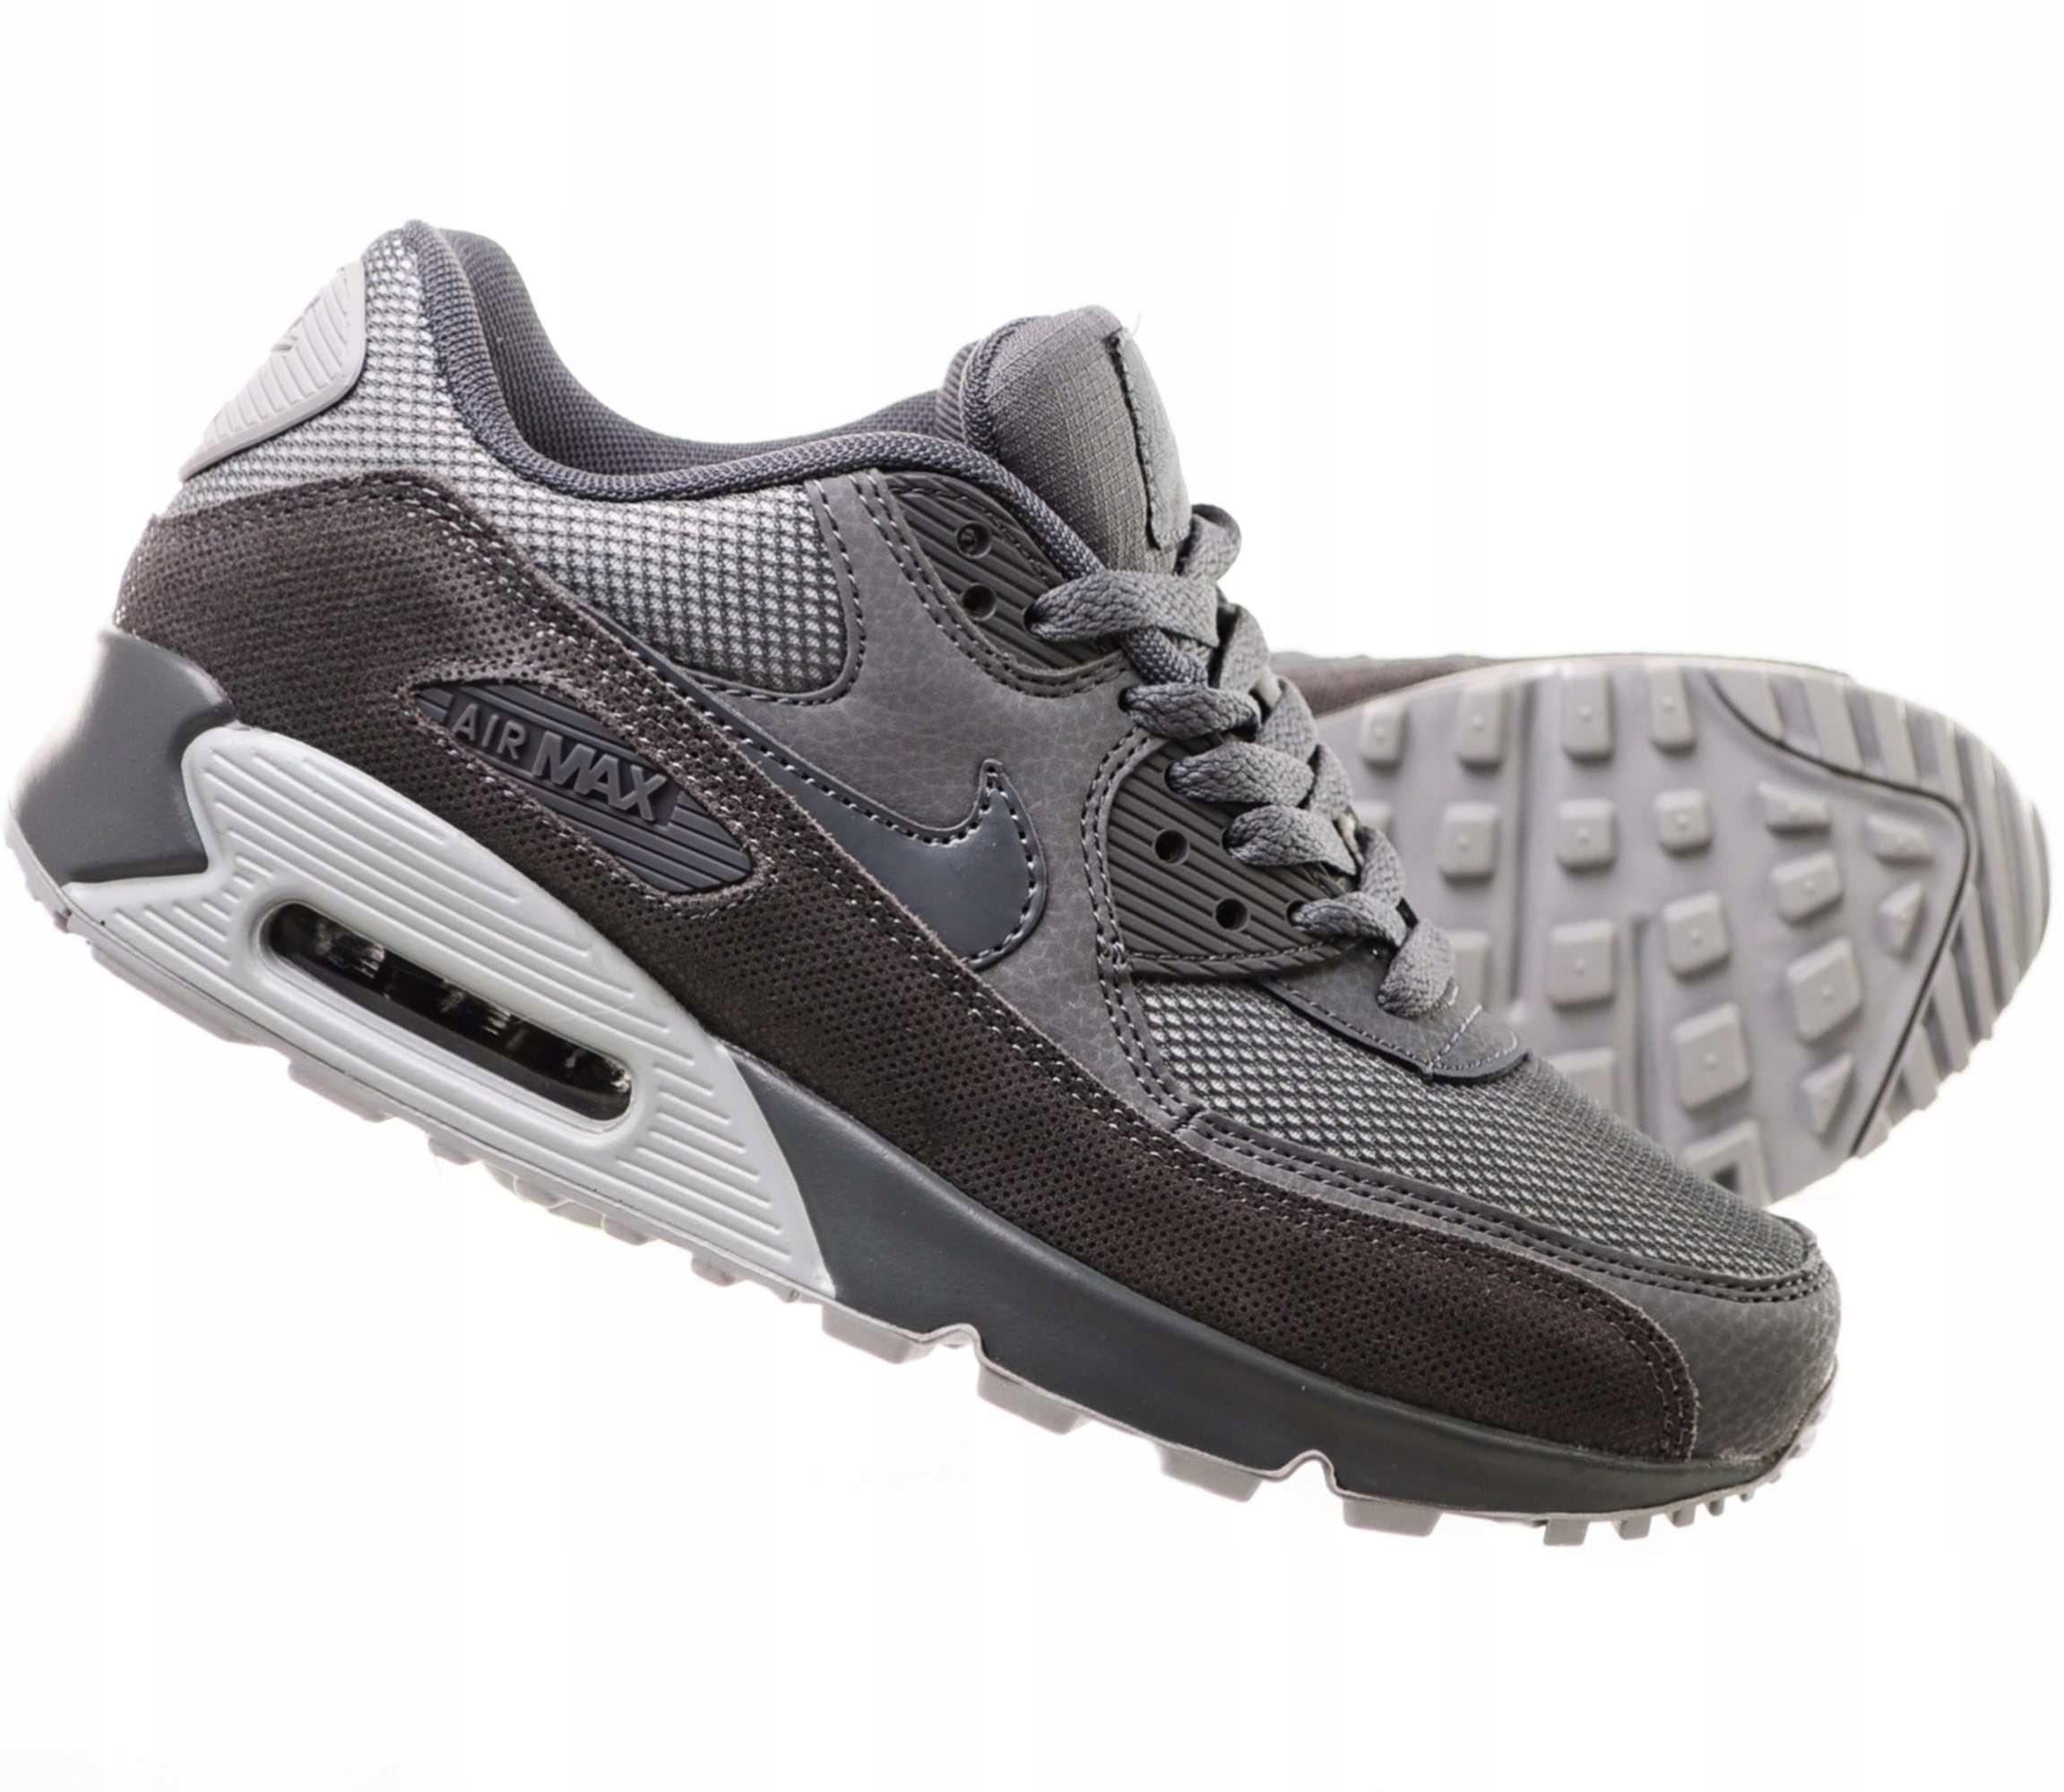 4392b074defe95 Buty Damskie Nike Air Max 90 Prem Sportowe 38 - 7884197828 ...